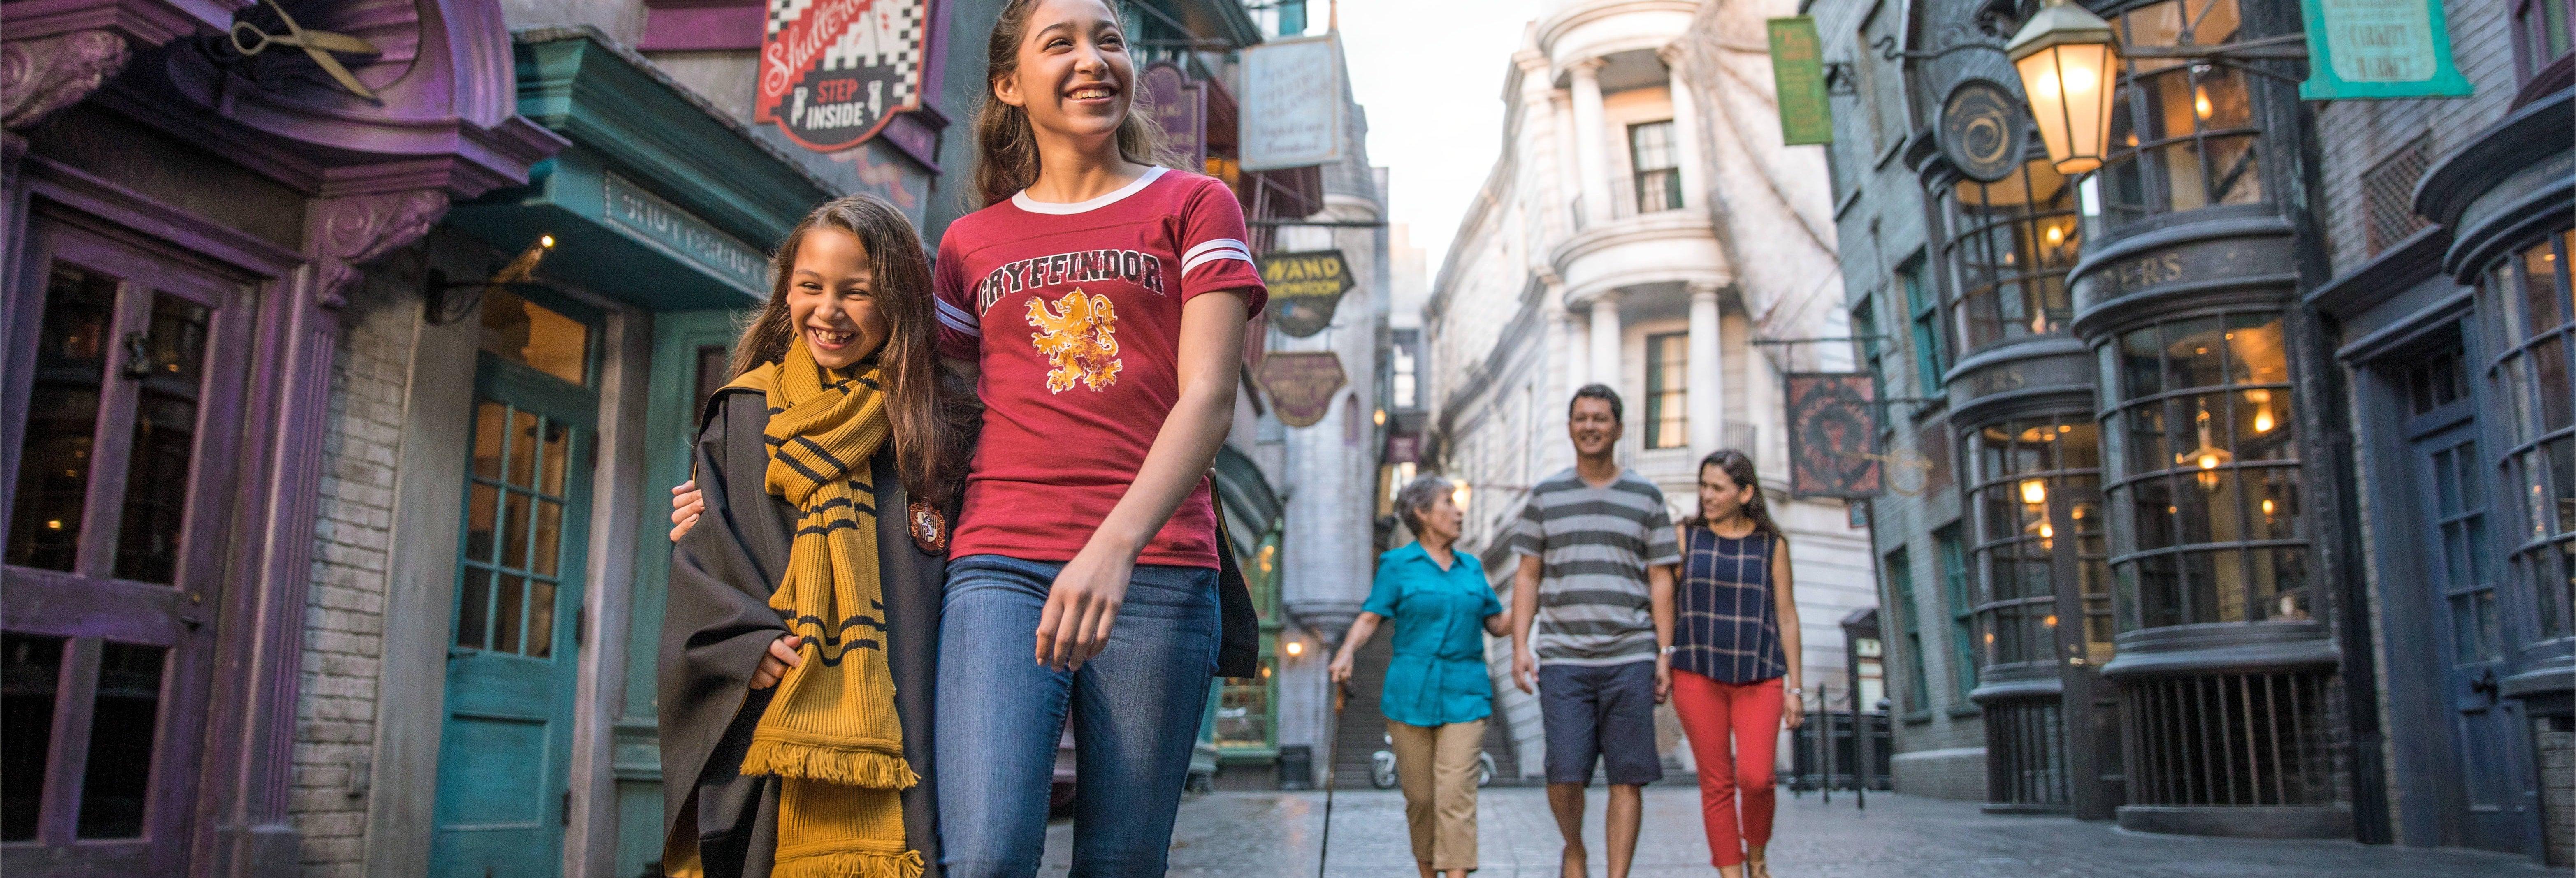 Excursión a Universal Studios Orlando